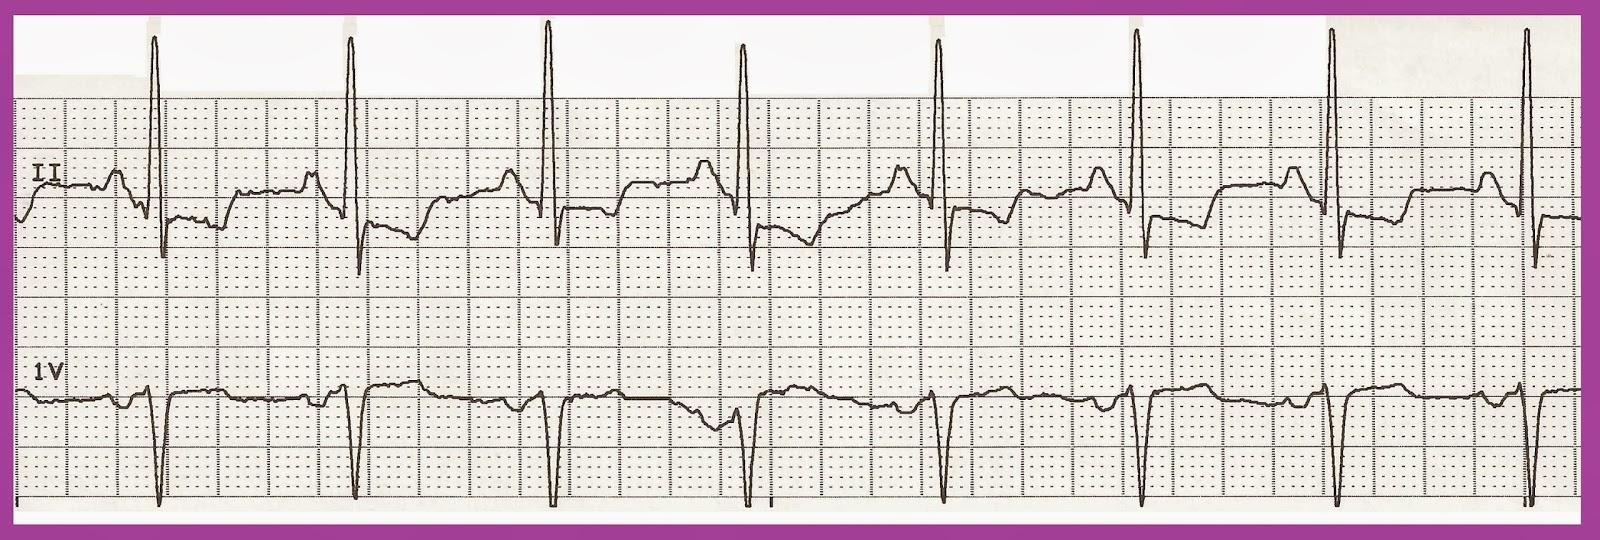 Normal sinus rhythm 02.jpg